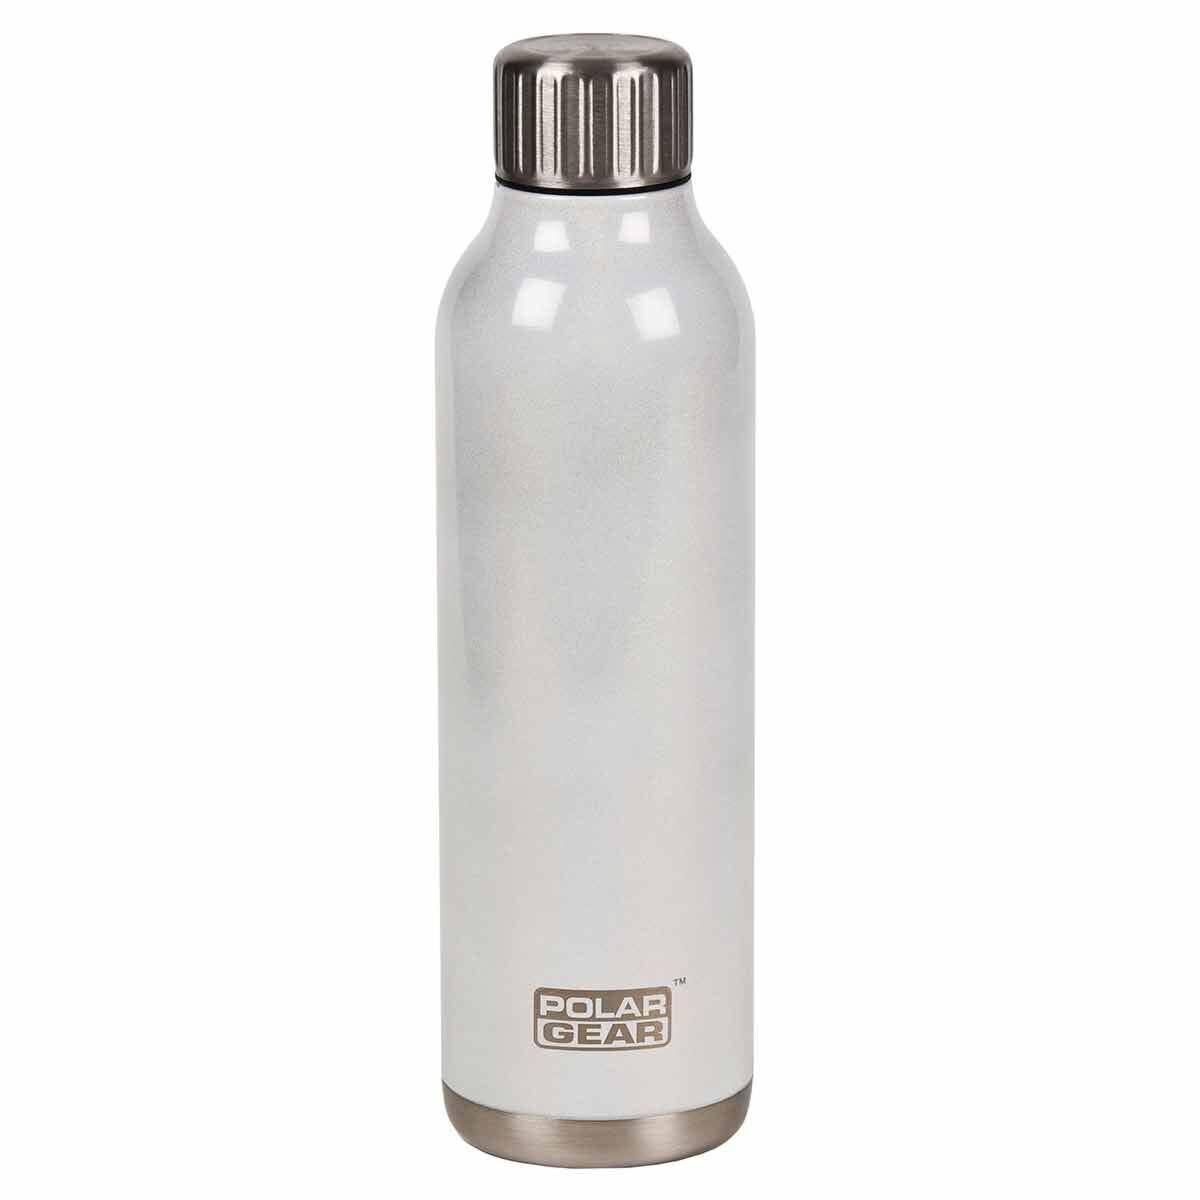 Polar Gear Orion Stainless Steel 500ml Insulated Bottle White